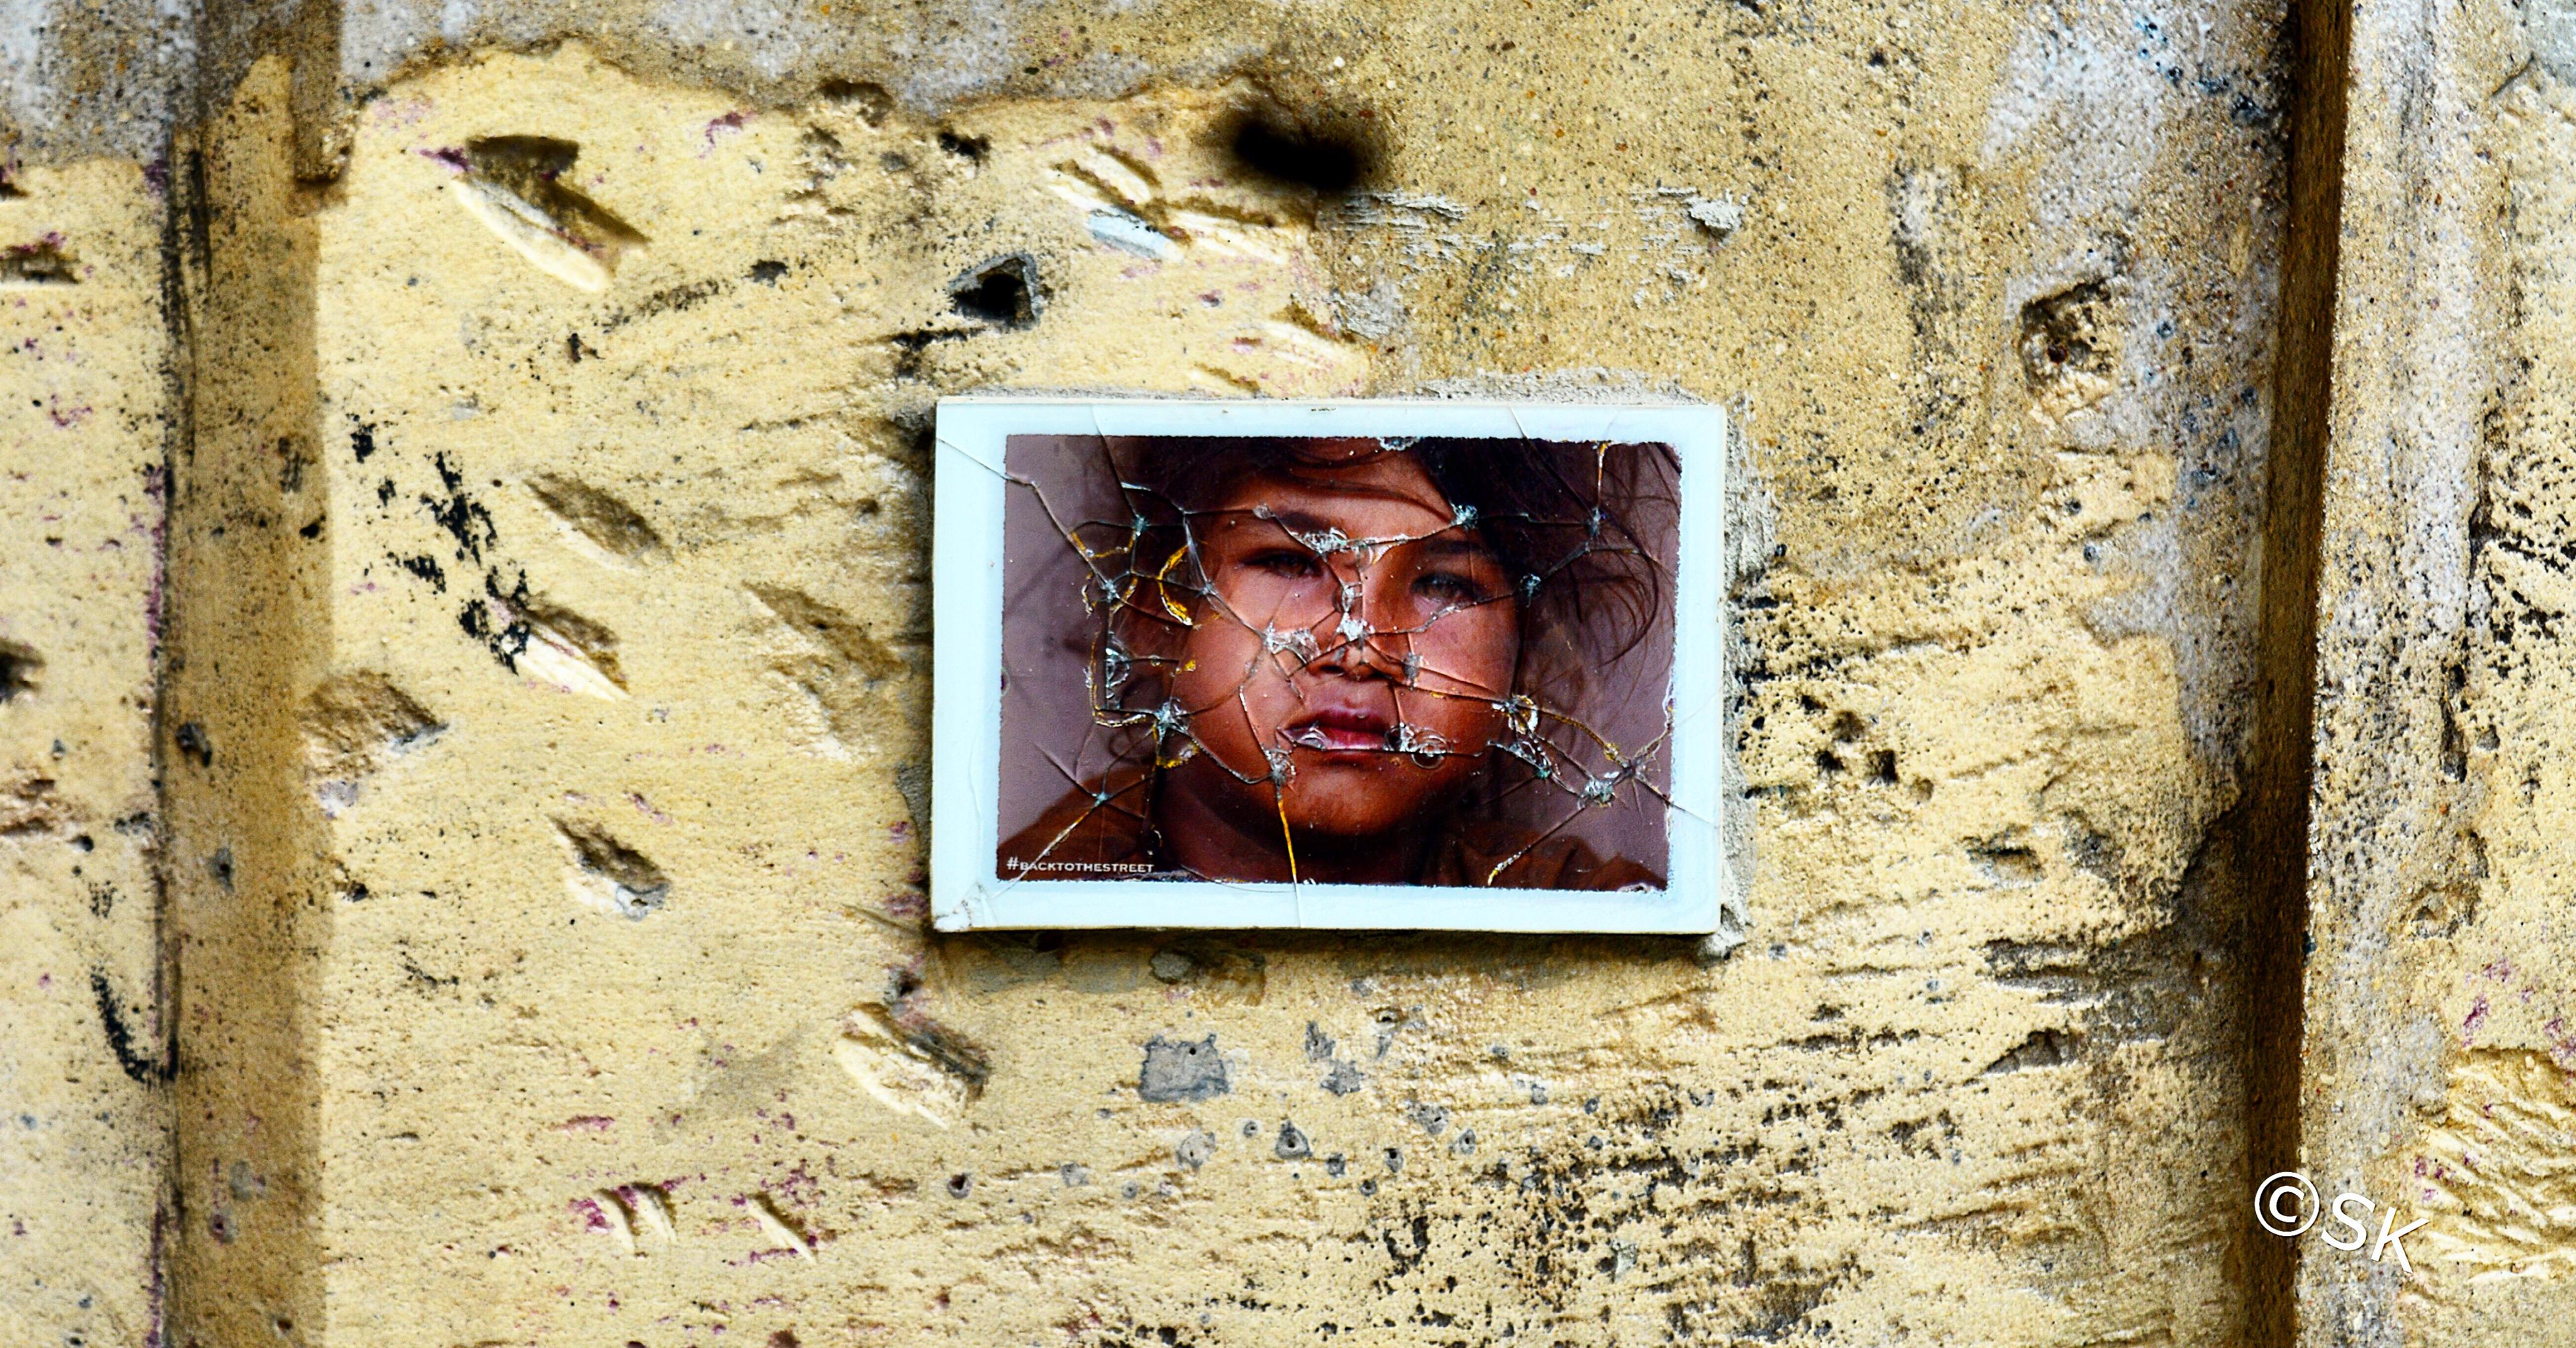 Stranger on a parisian wall